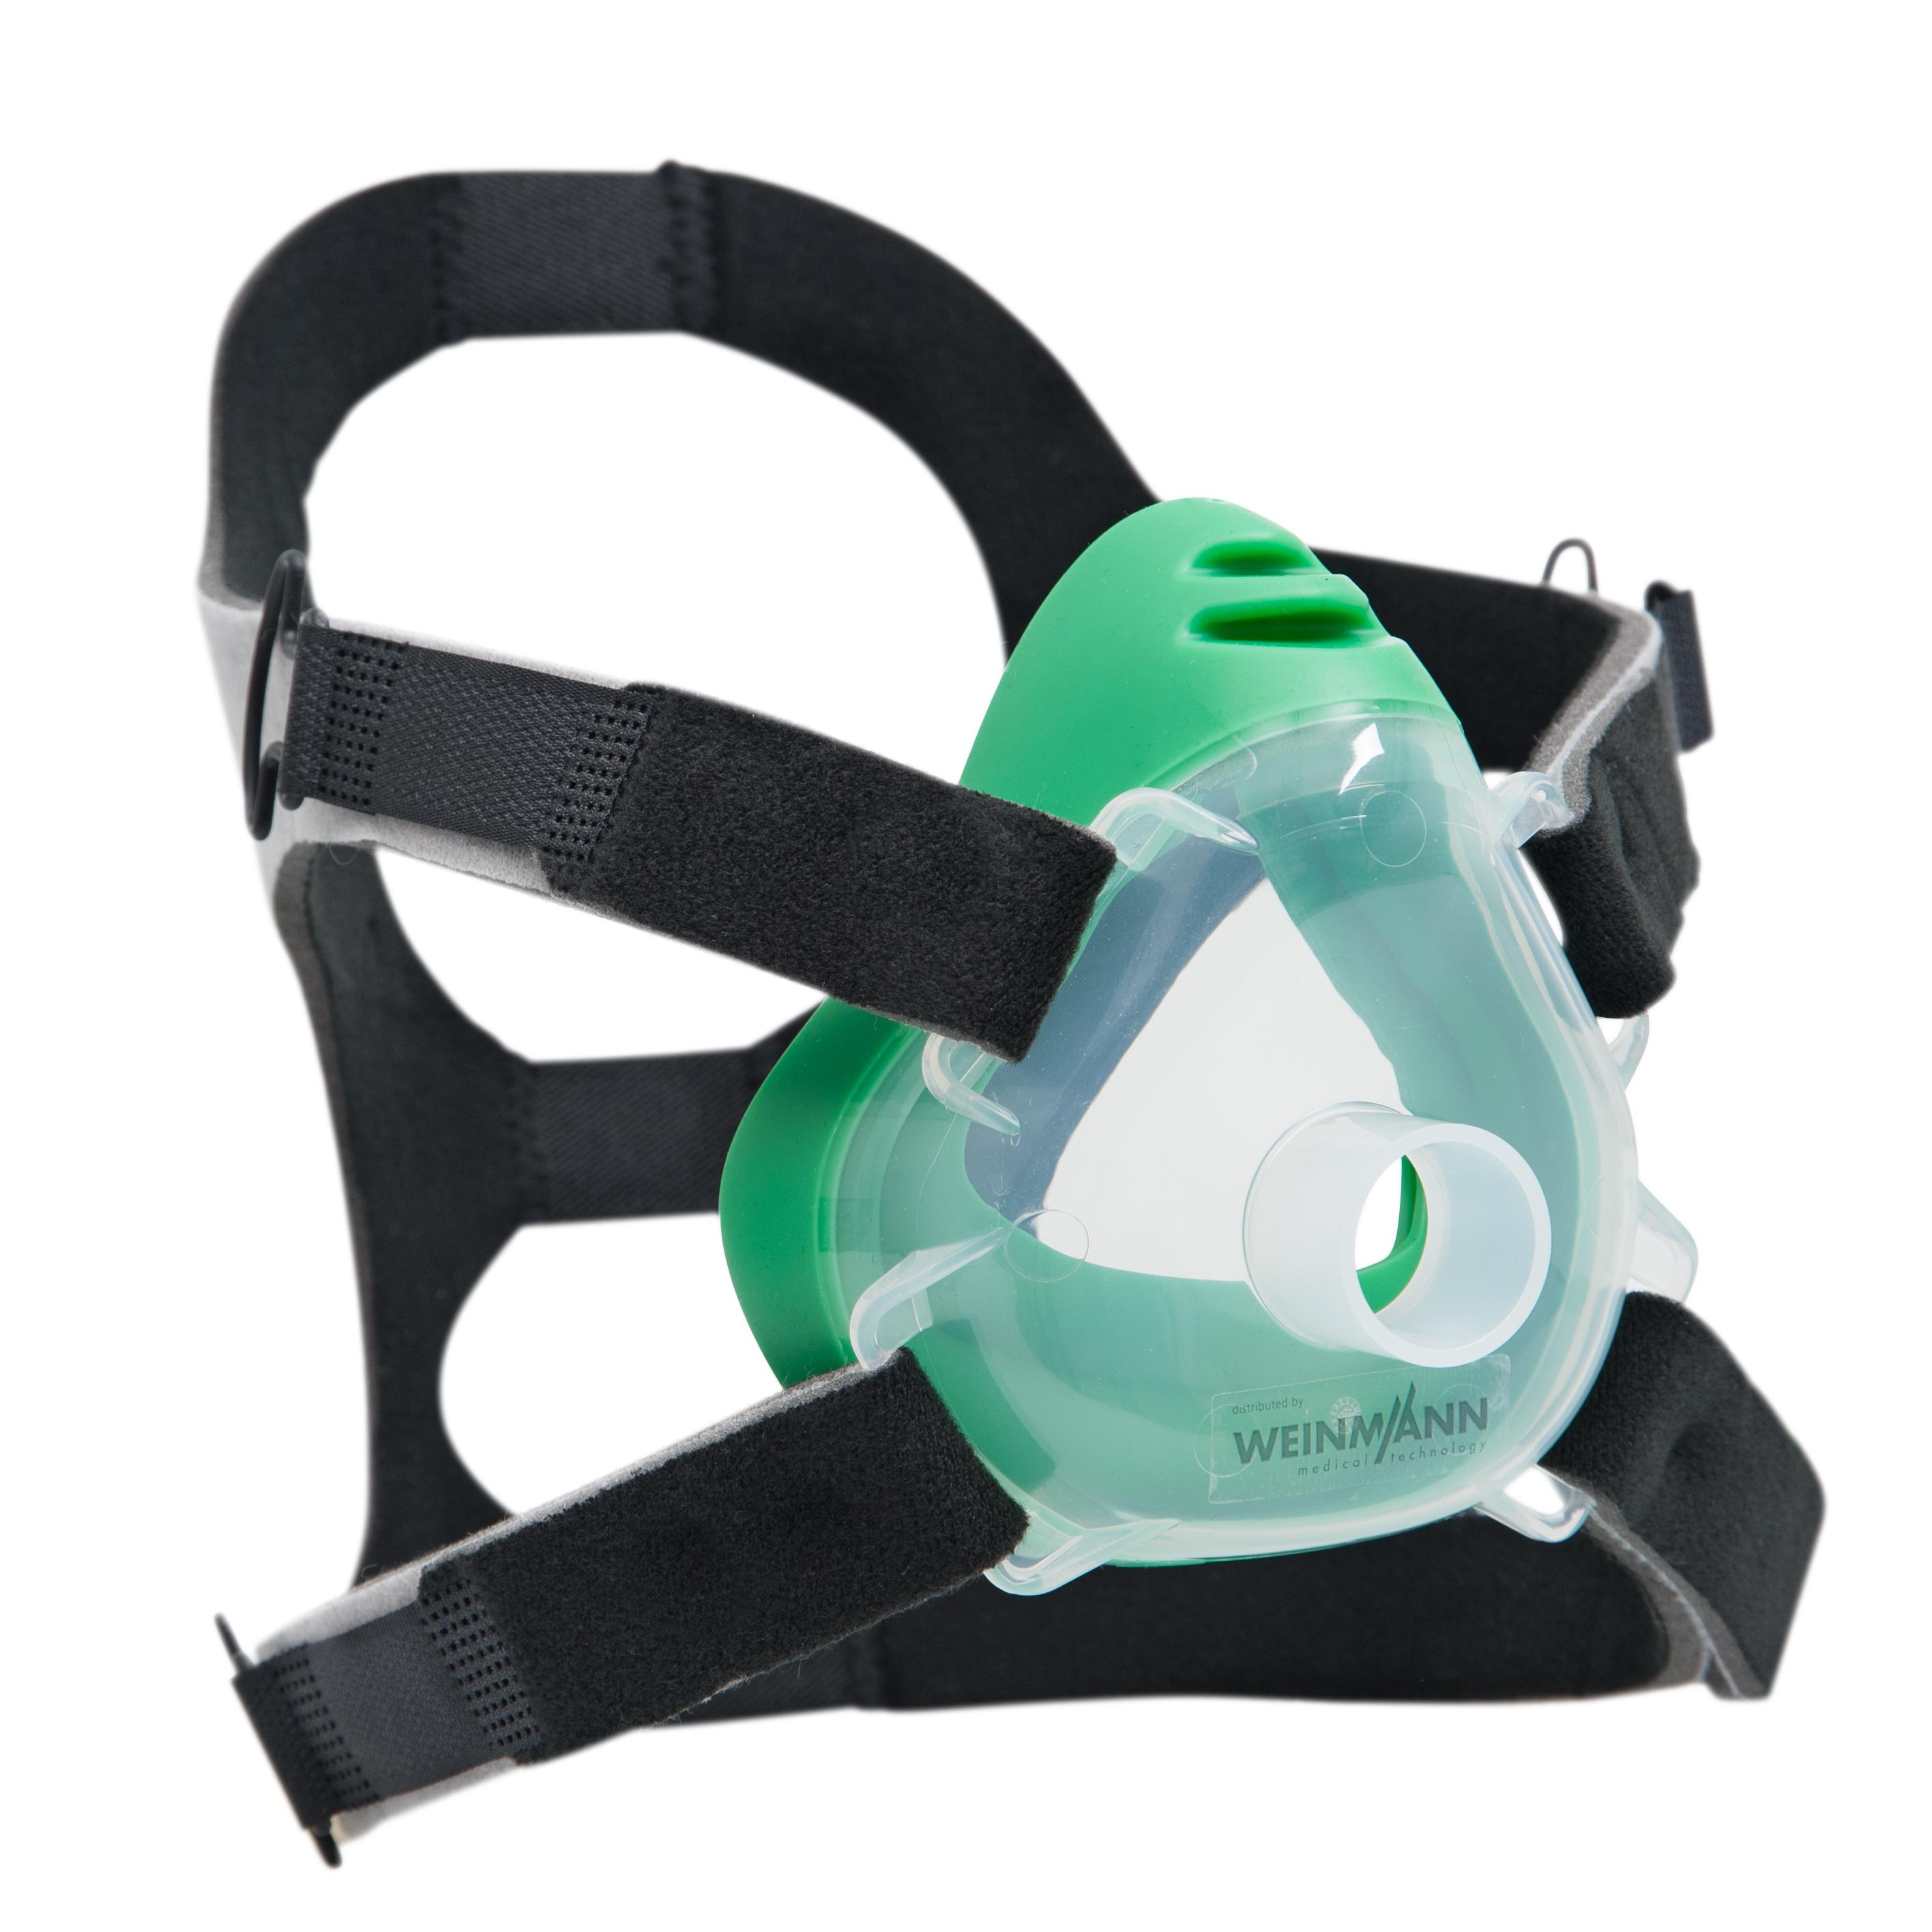 Premium CPAP-/NIV-Einwegmaske inkl. Kopfbänderung  Größ M (Erwachsener)